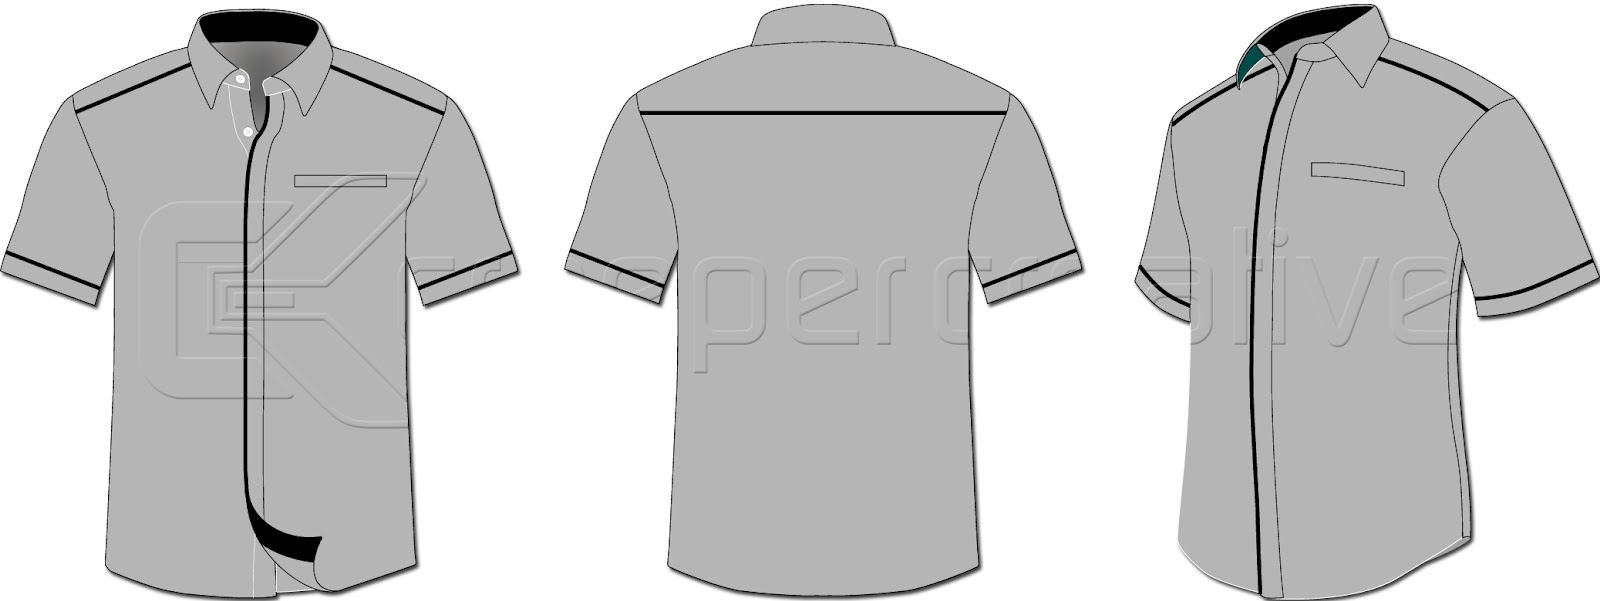 Corporate Shirt Cs 02 Series Casual Work Uniform Shop